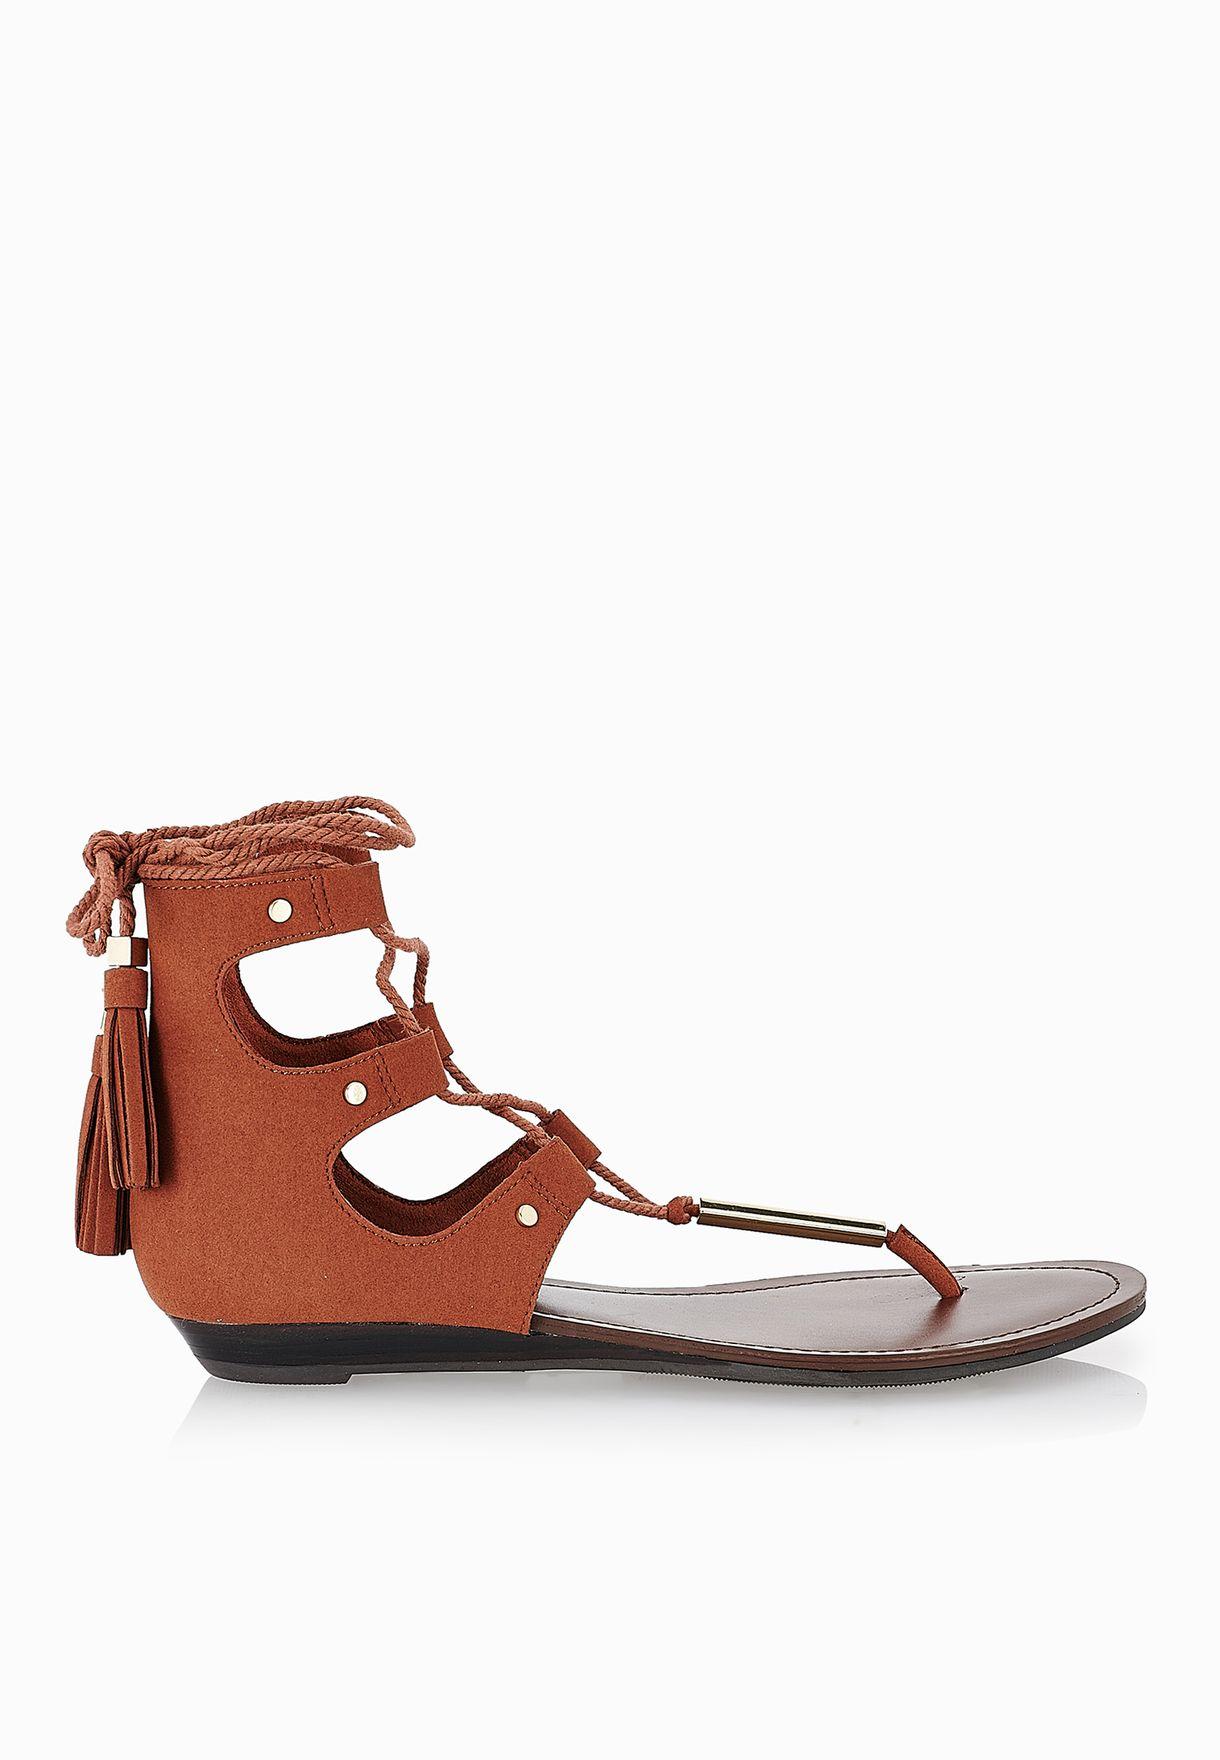 369a944130cc Shop Aldo browns Jakki Gladiator Back Zip Sandals for Women in Saudi -  AL729SH02CZL